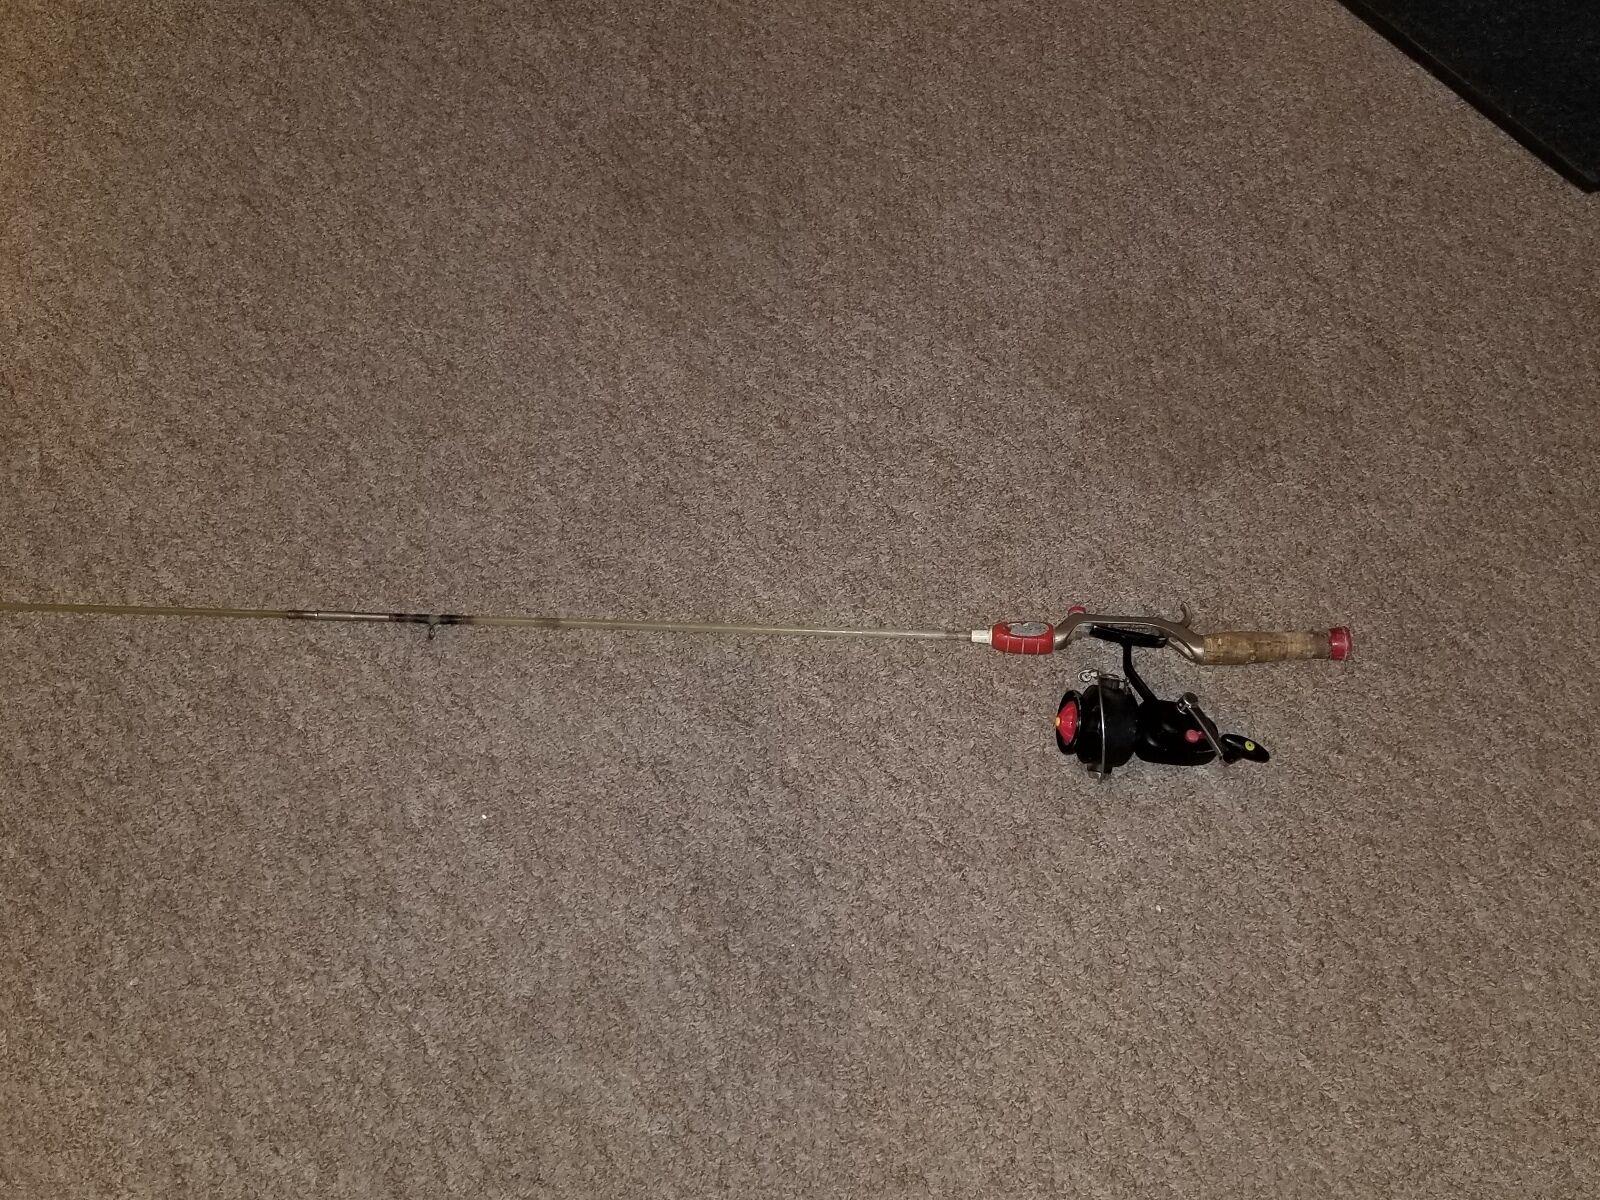 VINTAGE  SOUTH BEND MASTER-GRIP FIBERGLASS FISHING ROD & SOUTH BEND  840 REEL